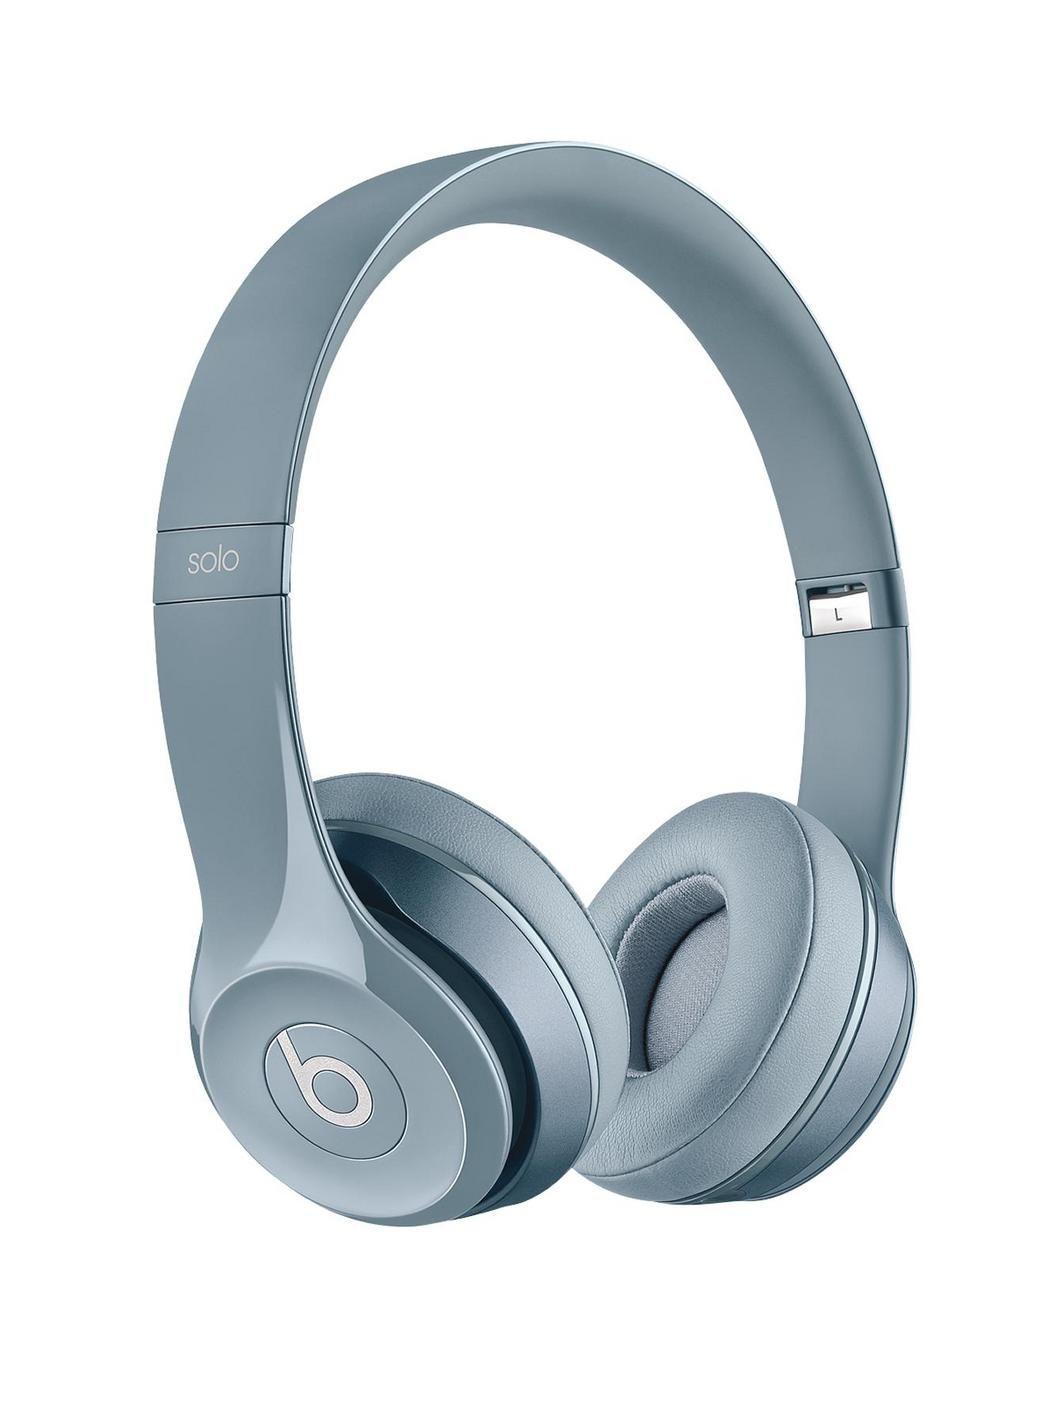 Beats Electronics (AKA Beats by Dre) has announced the new Beats headphones. d075889b61